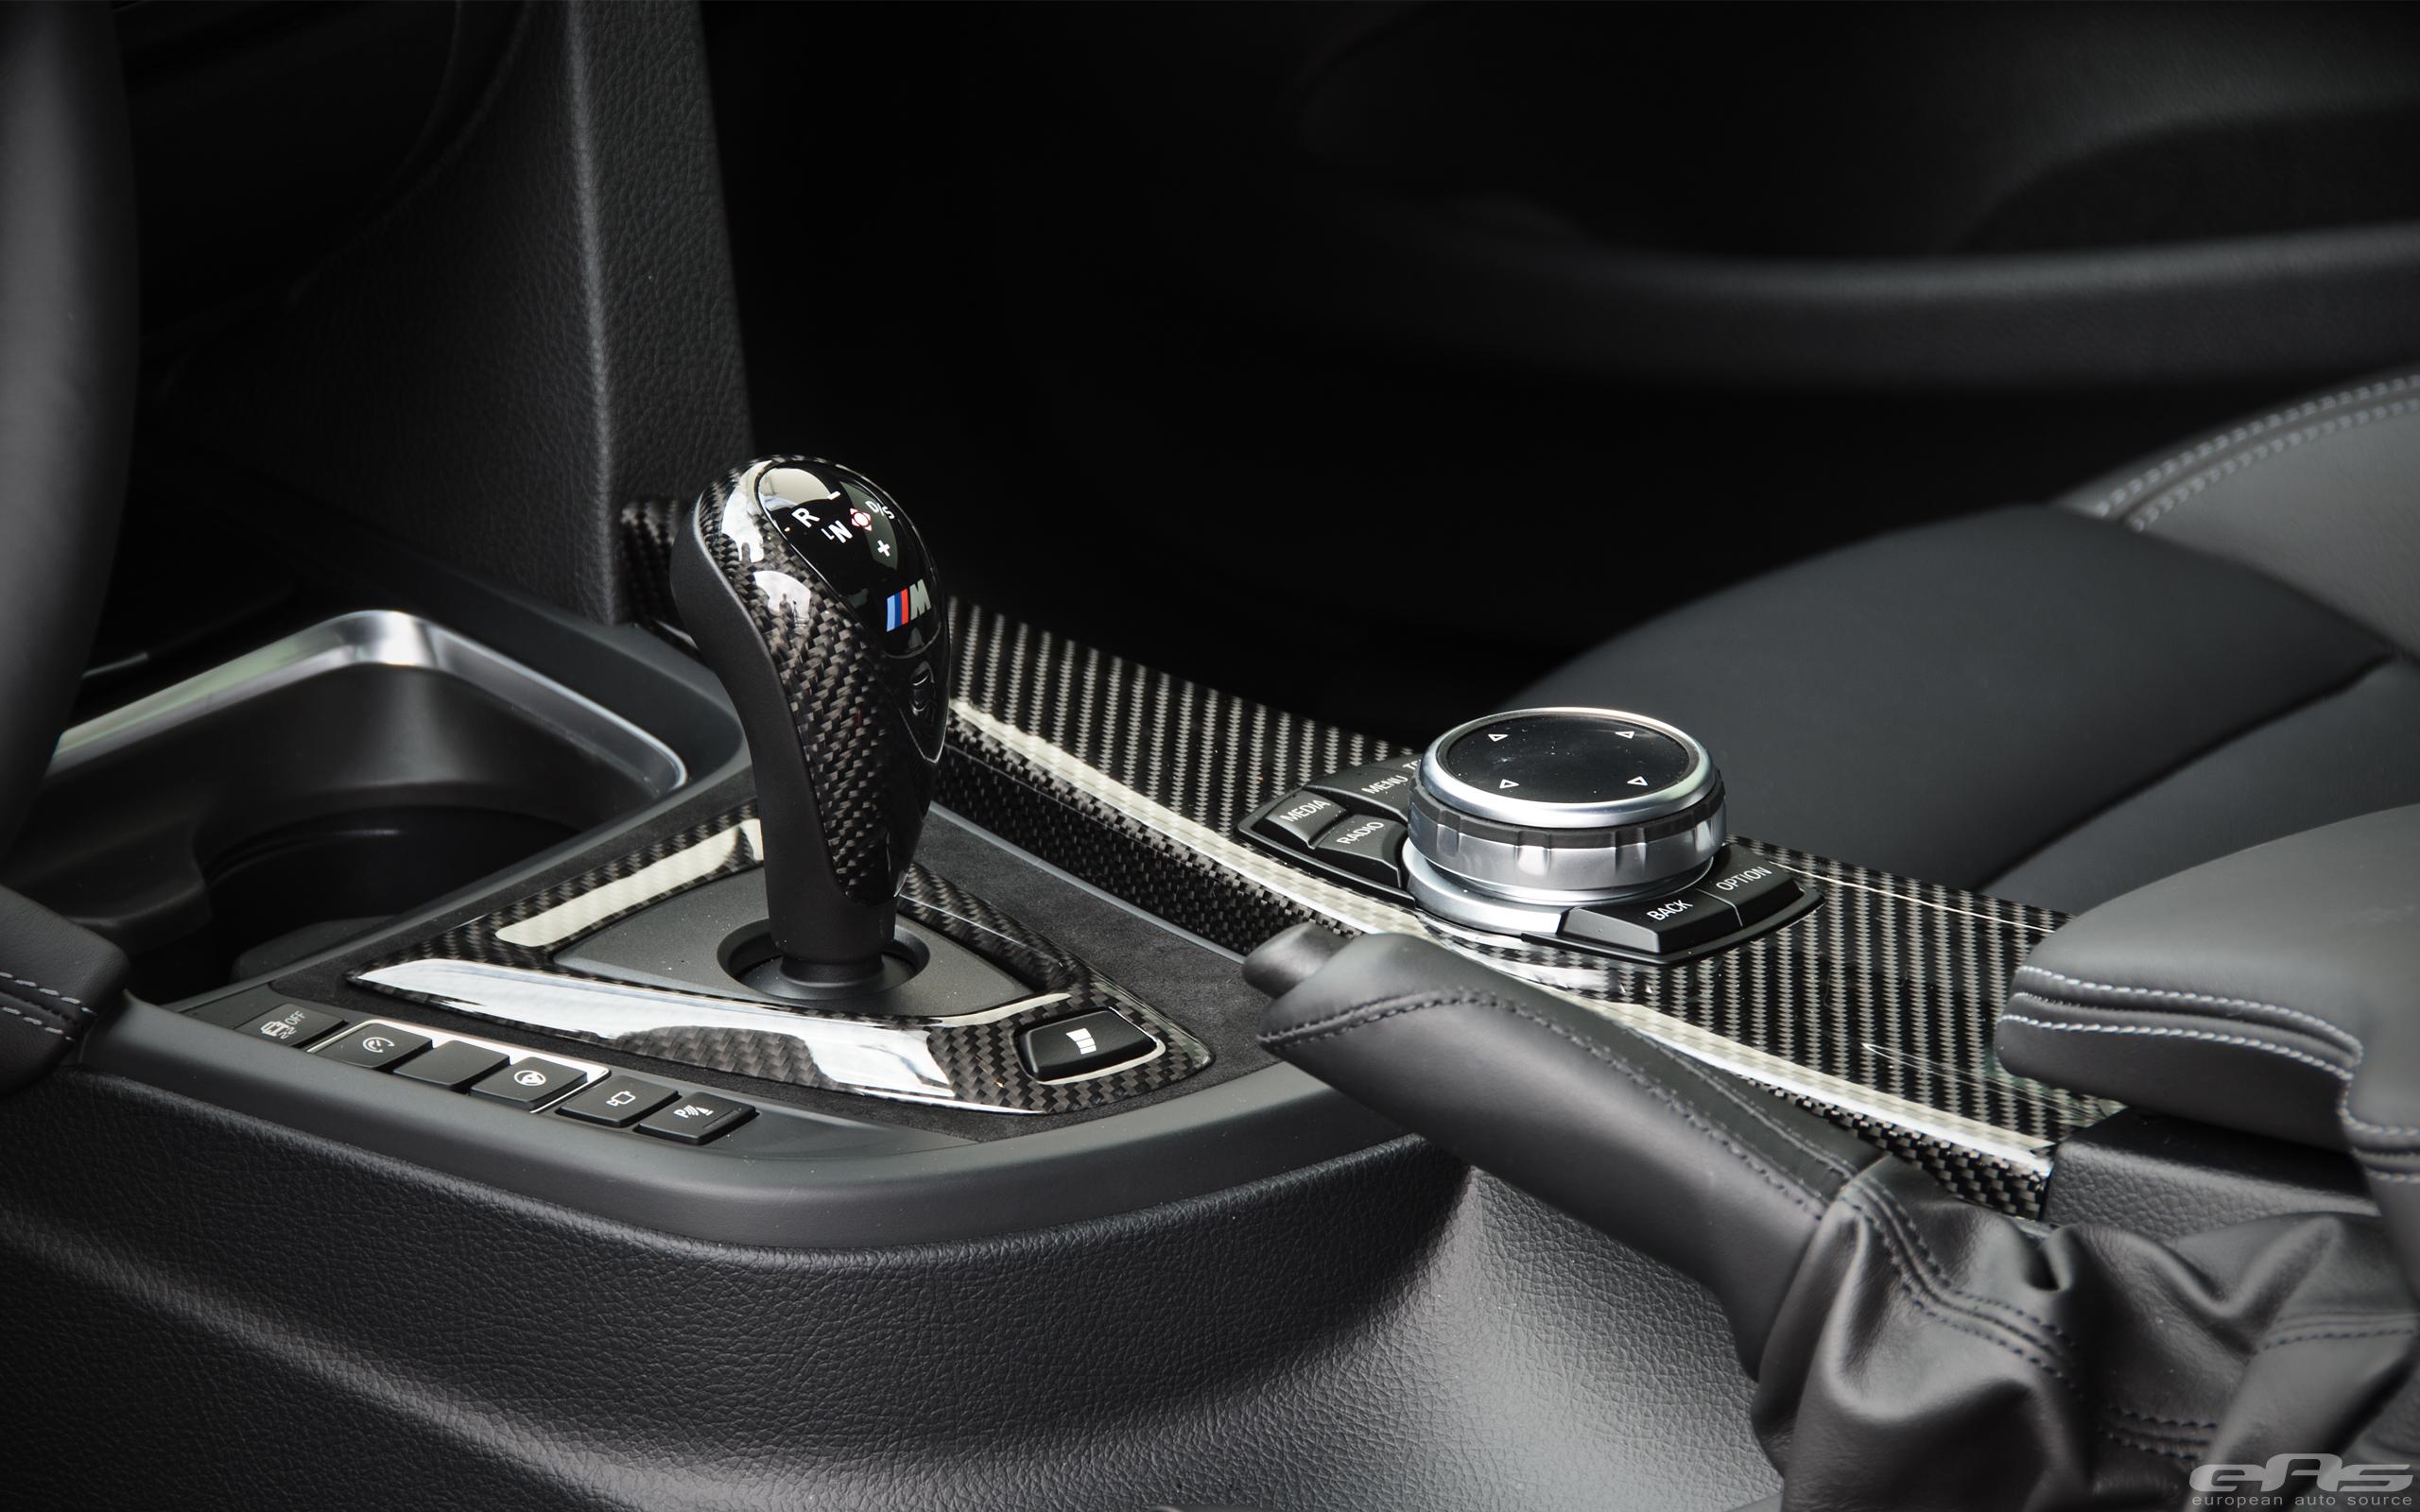 Carbon Fiber Interior Parts Installed On A BMW F82 M4 Image 4